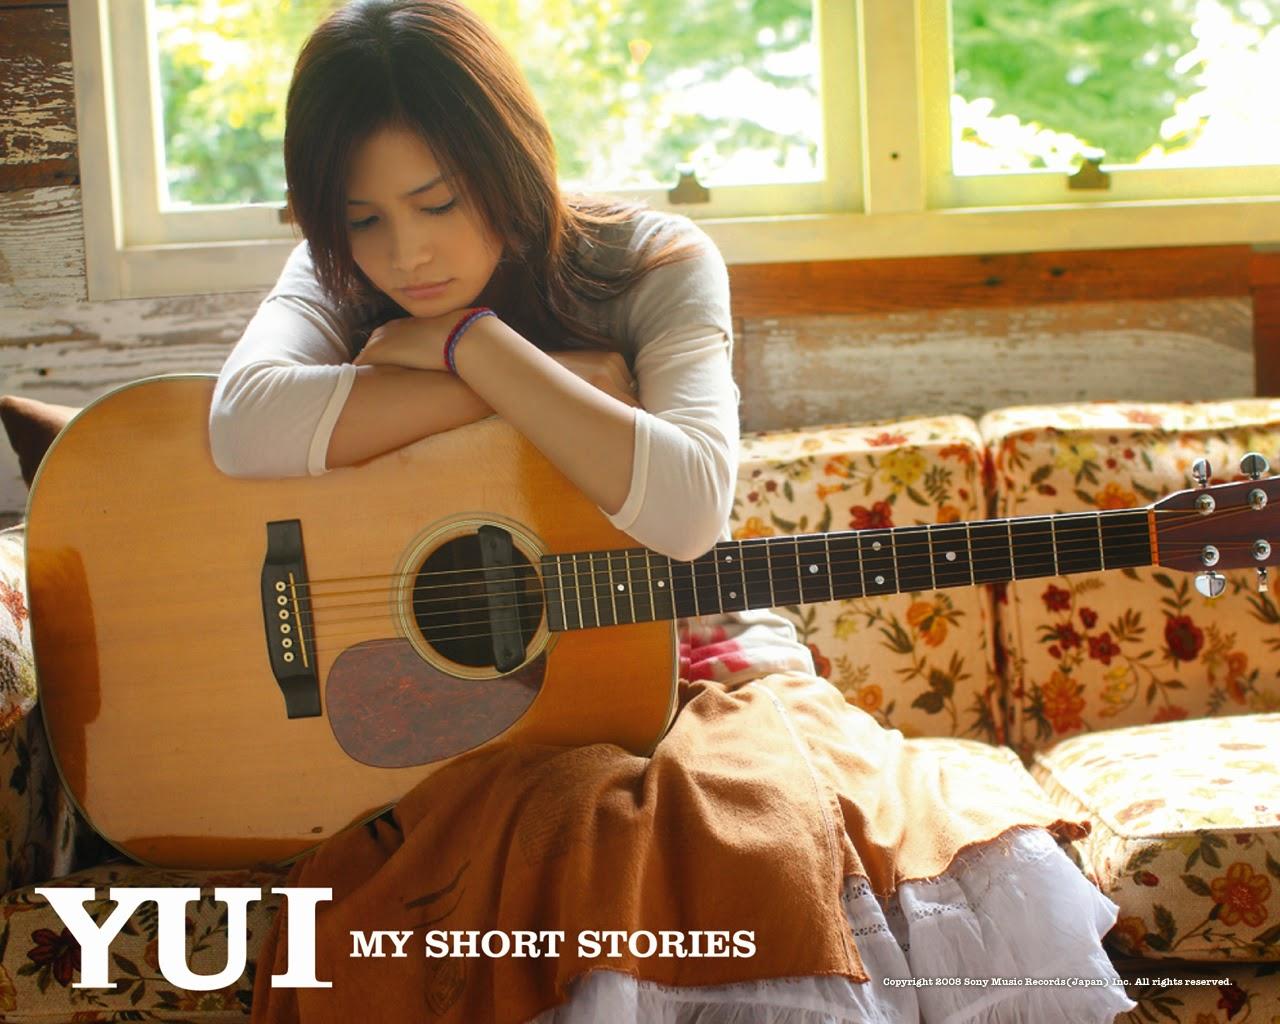 Biografi Yui, Penyanyi Asal Jepang